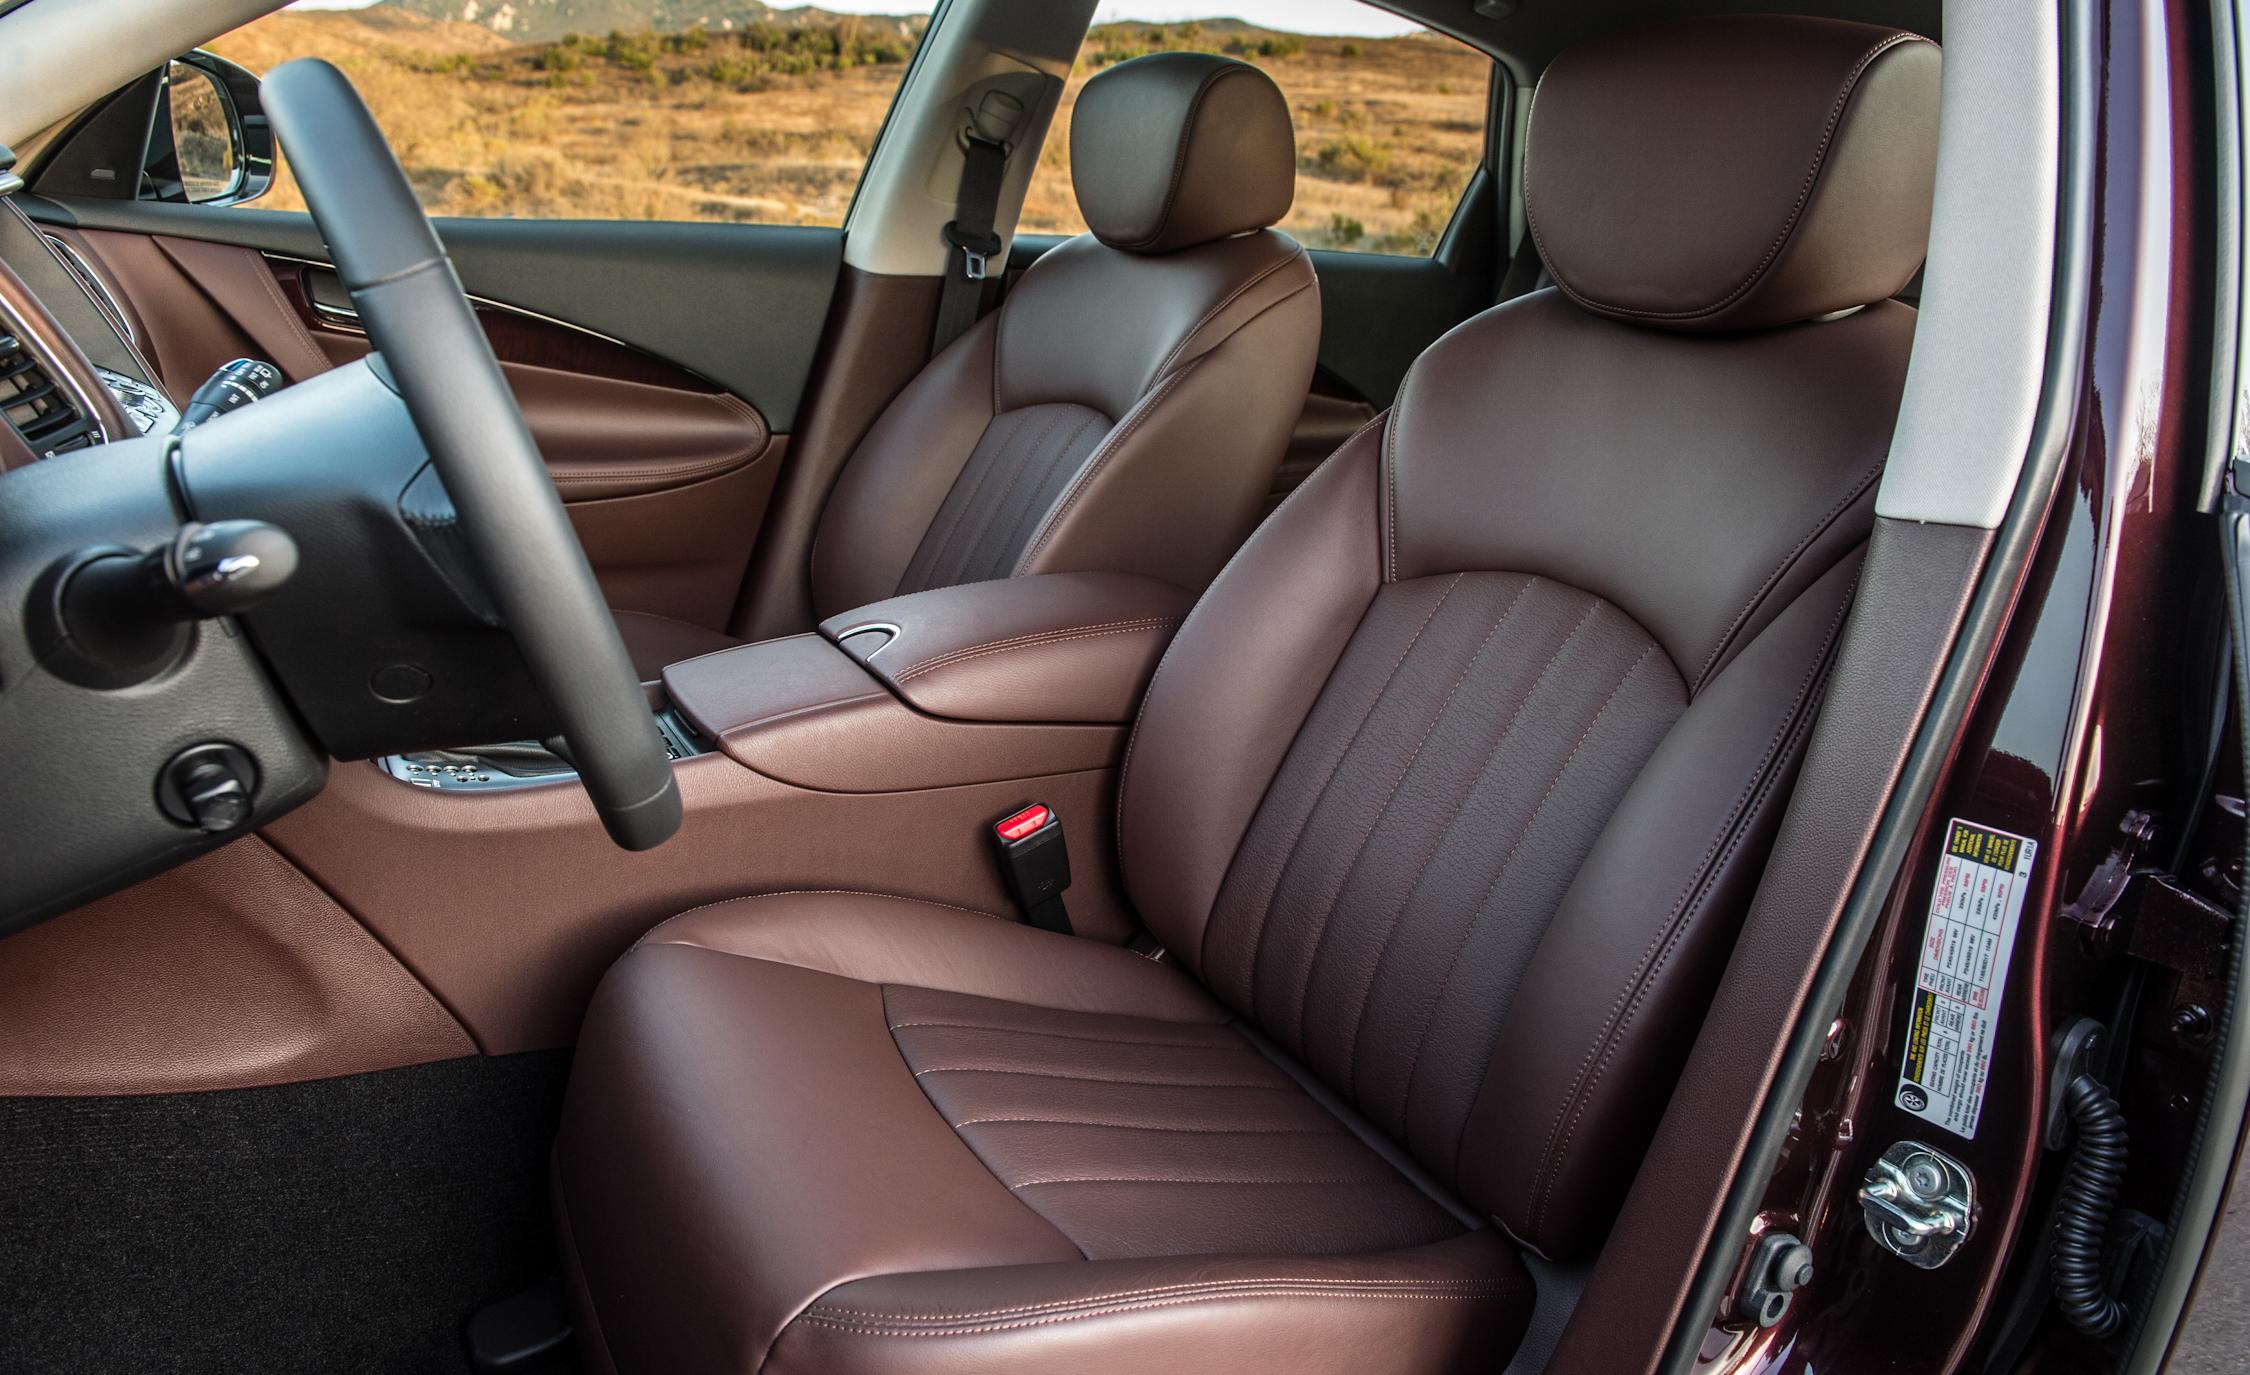 2016 Infiniti QX50 Interior Seats Front Passenger